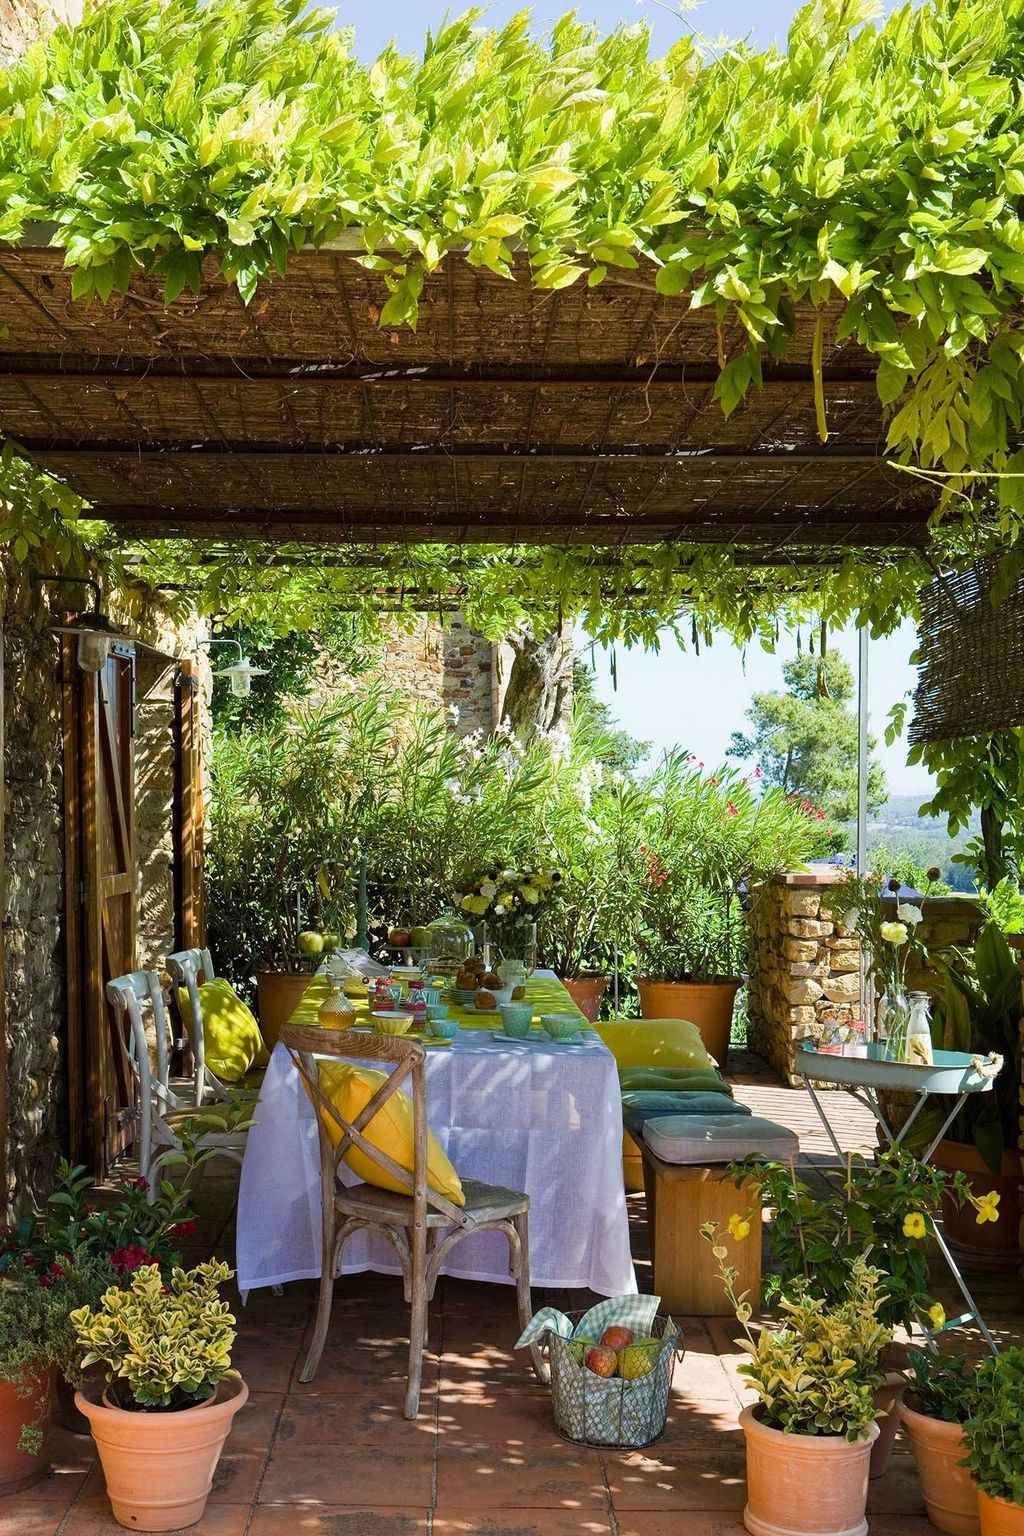 Nice 85 Cozy Backyard Patio Deck Design Ideas Https Frontbackhome Com 6209 85 Cozy Backyard Patio Deck Des Backyard Pergola Cozy Backyard Patio Garden Design